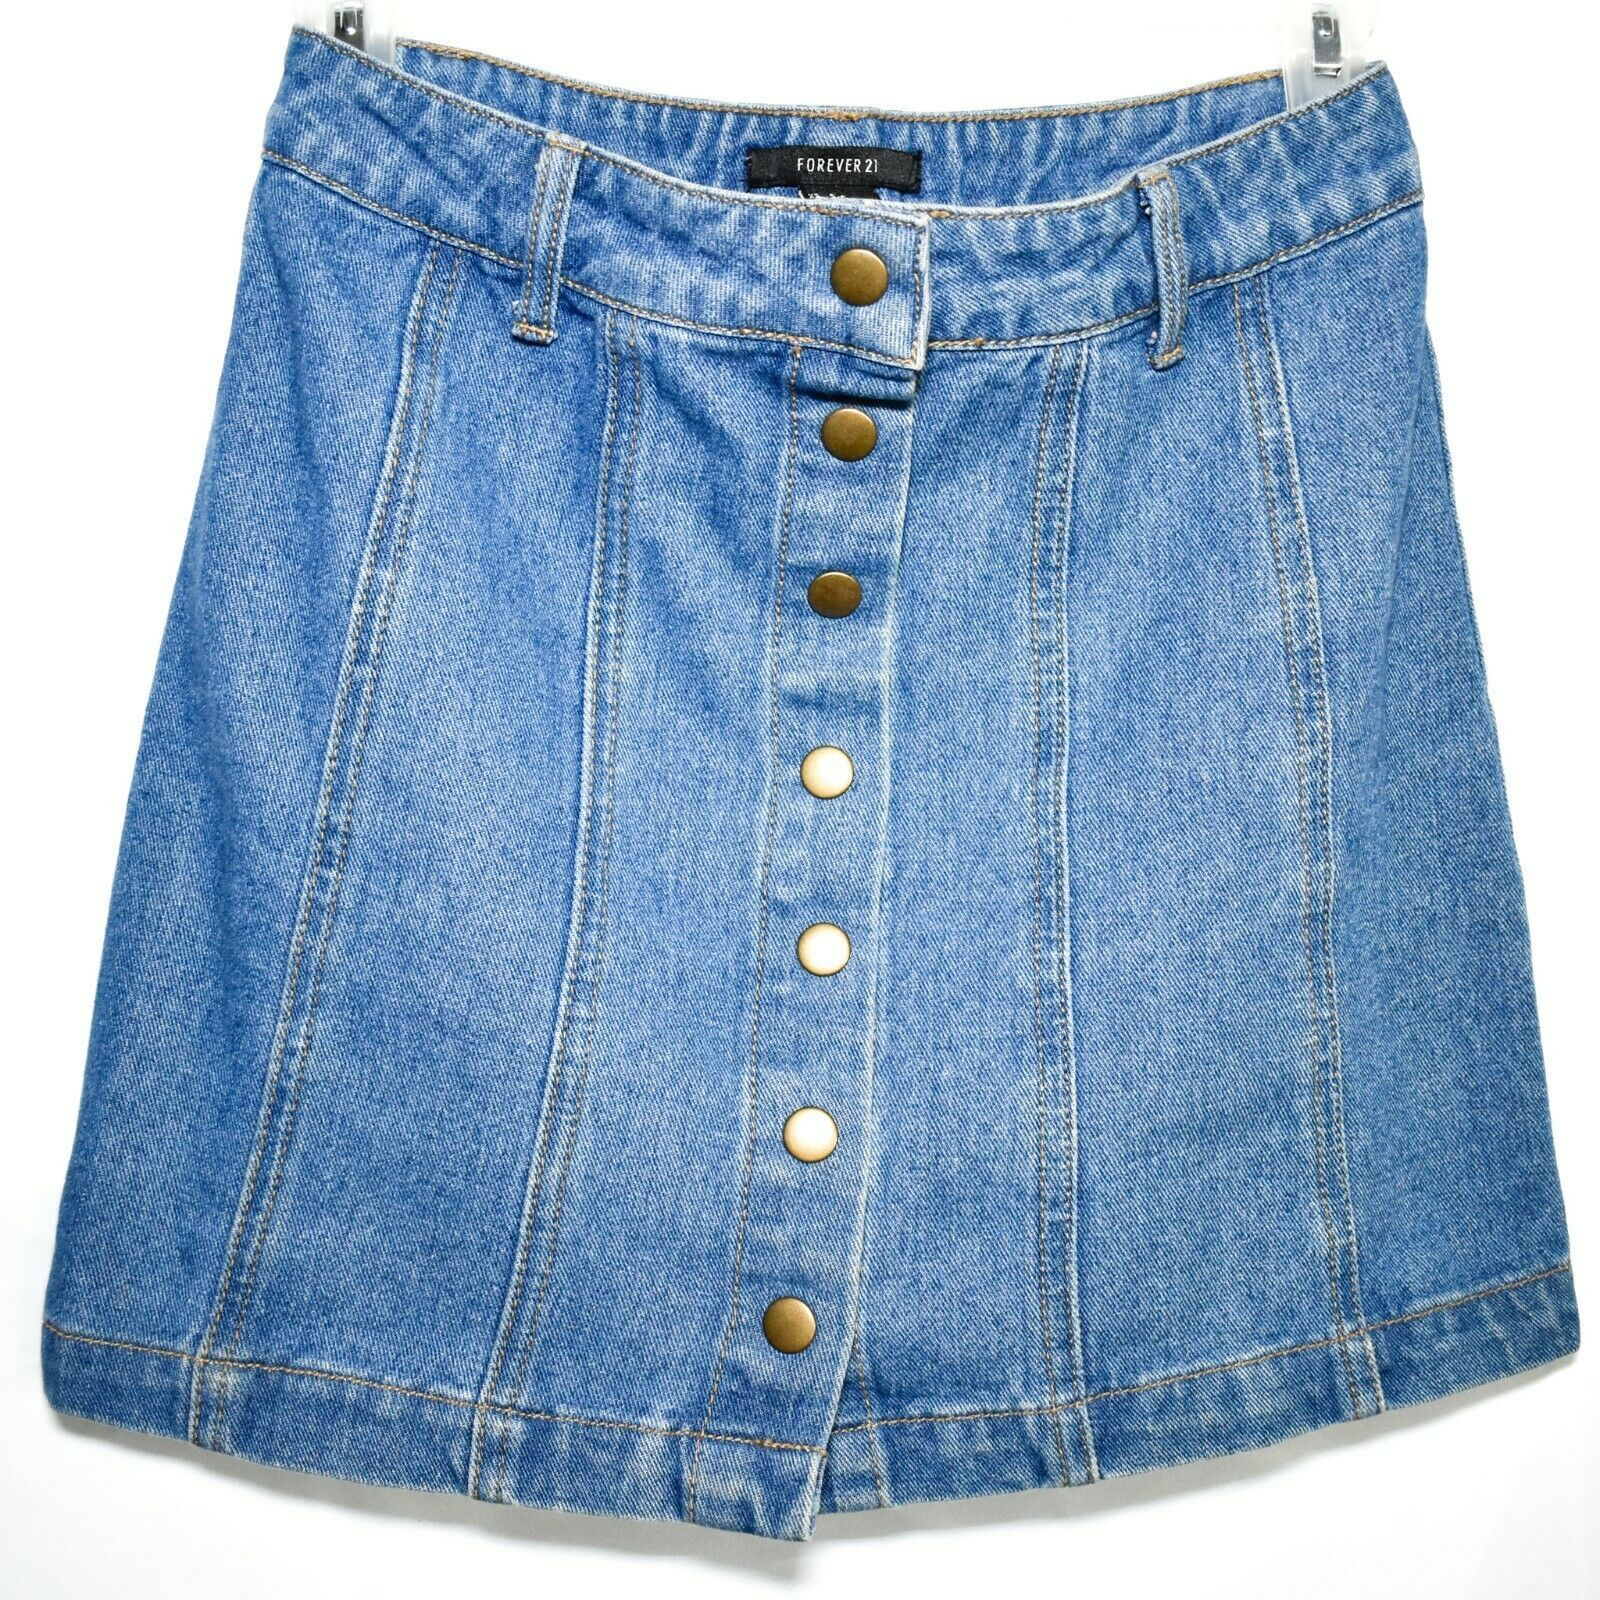 Forever 21 00095179 Button Up Denim Blue Jean Skirt Size S